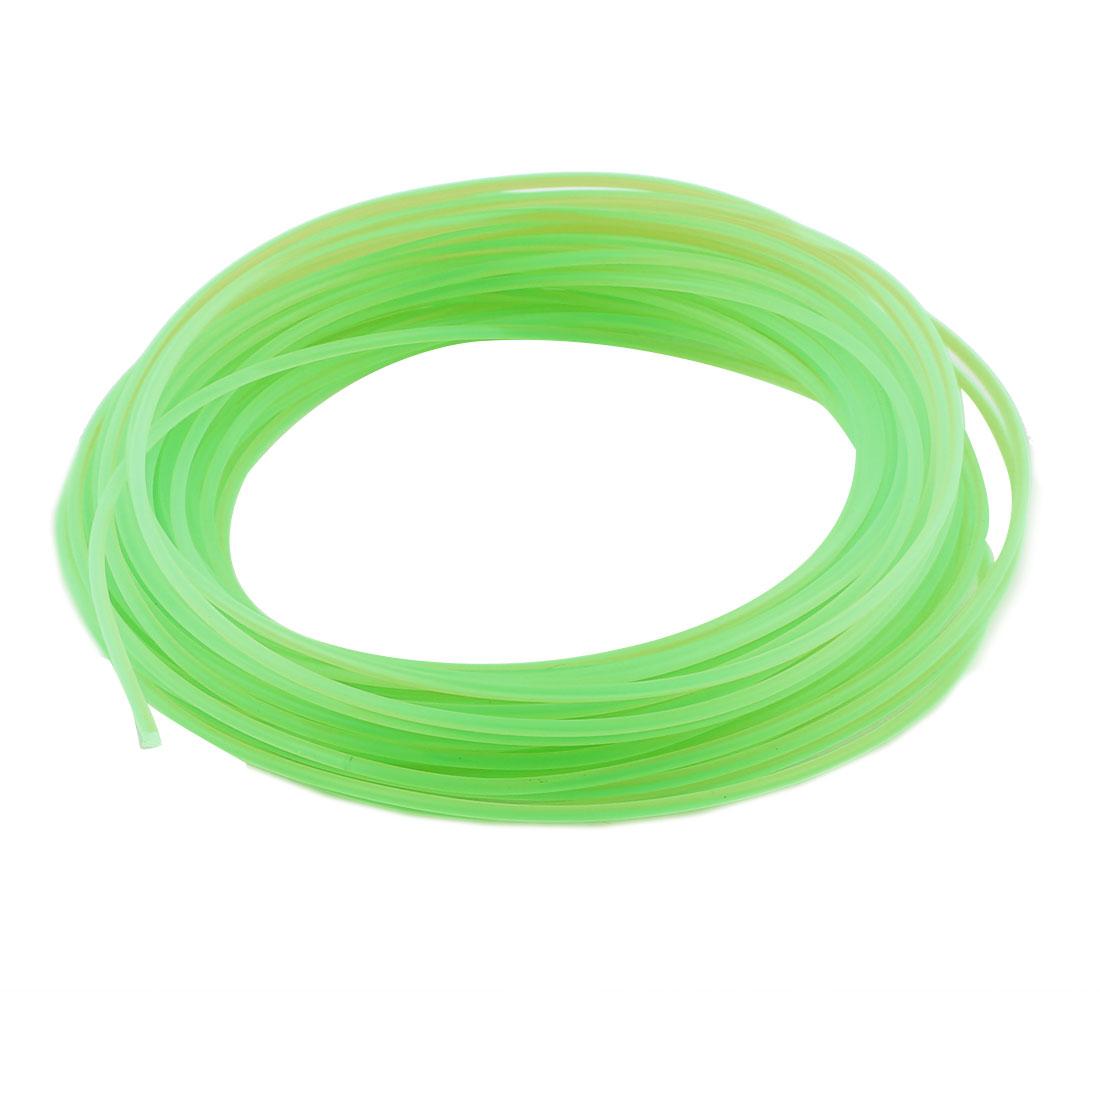 10m 3D Printer Pen Painting Filament Refills PLA Printing Material Transparent Green